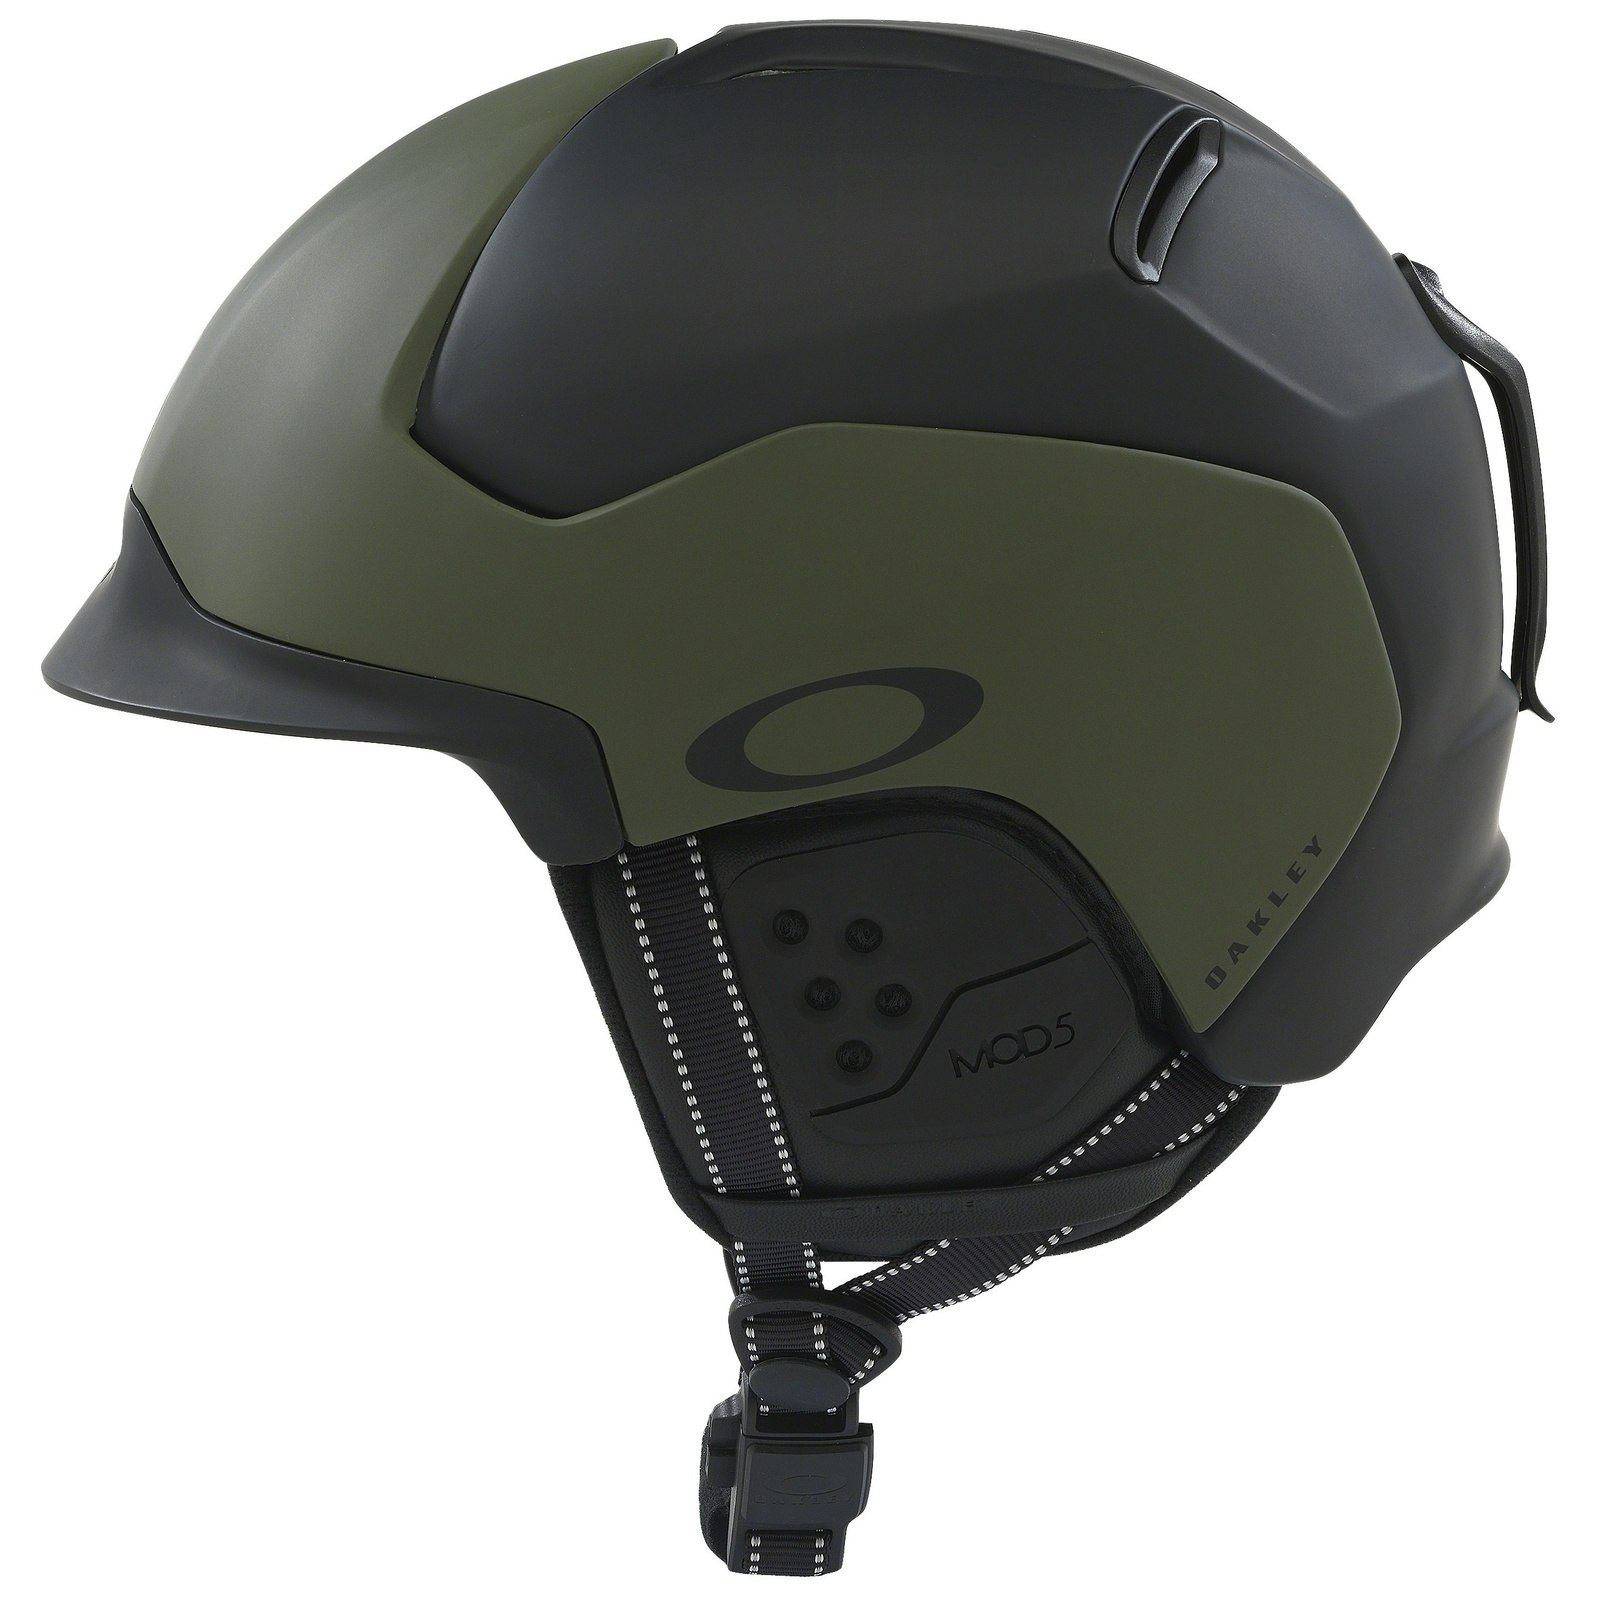 Ski Helmet Sale >> Oakley Men S Mod5 Ski Helmet On Sale Powder7 Com